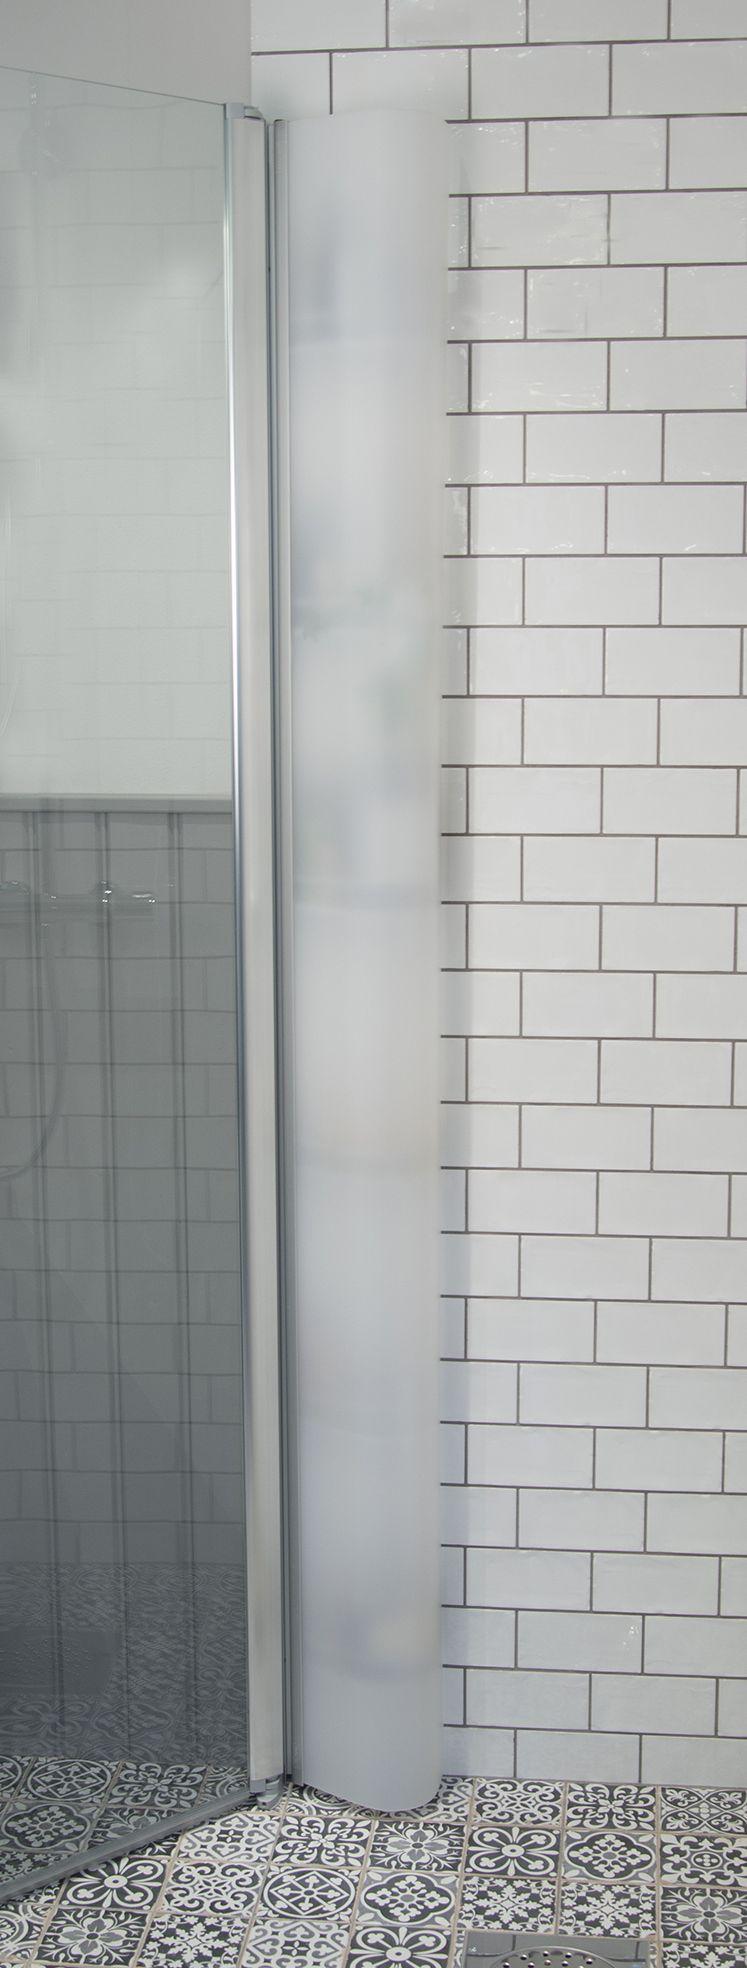 Smala badrumsidéer som förblir snygga